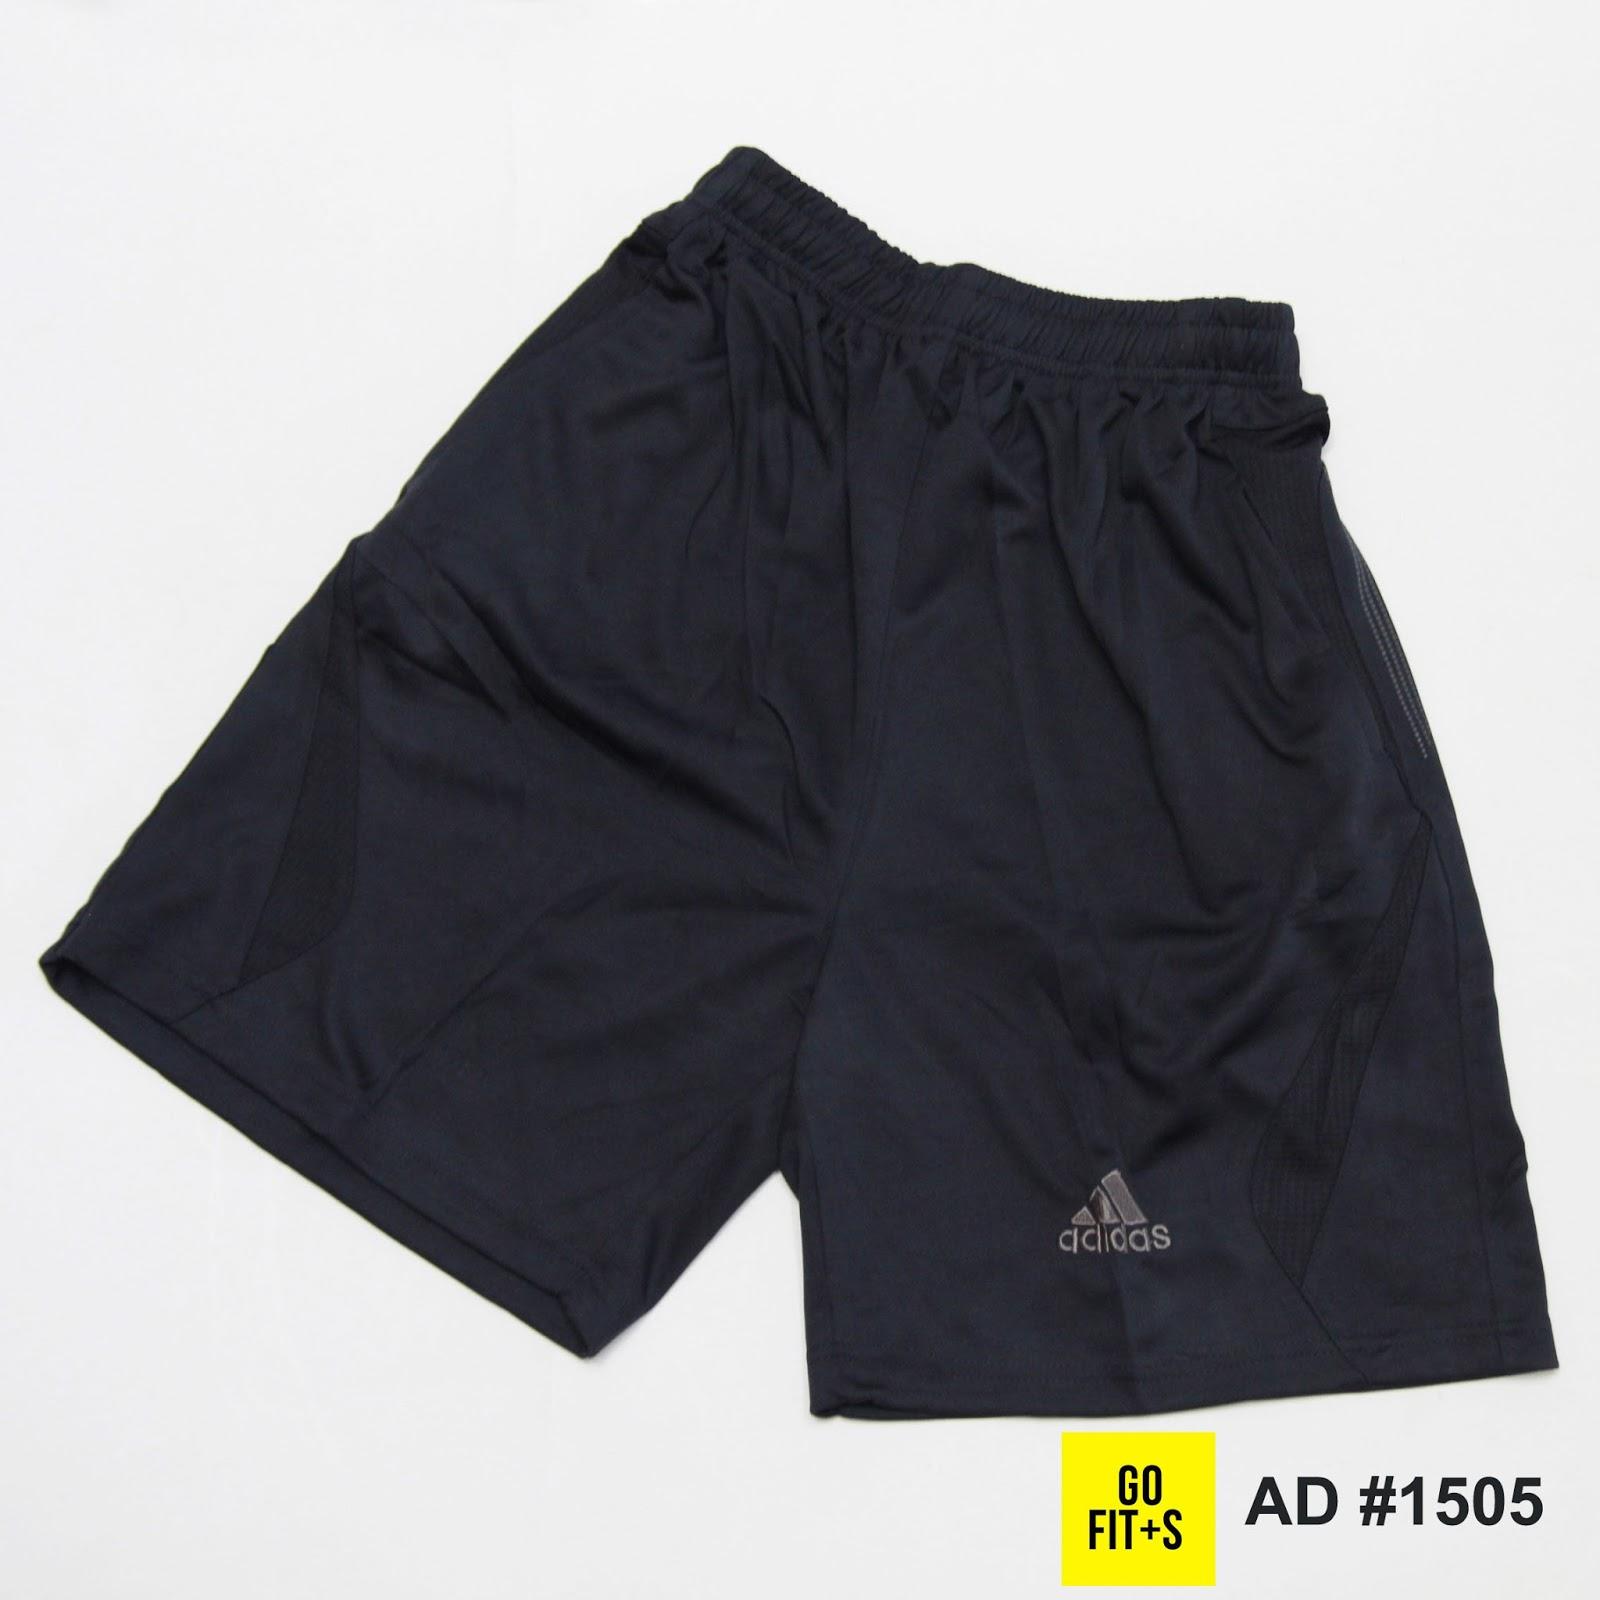 Gofits Celana Olahraga Nike Adidas Lotto Bola Futsal Basket Supplier Grosir Baju Badminton Jersey Jaket Gym Facebookcom Gofitss